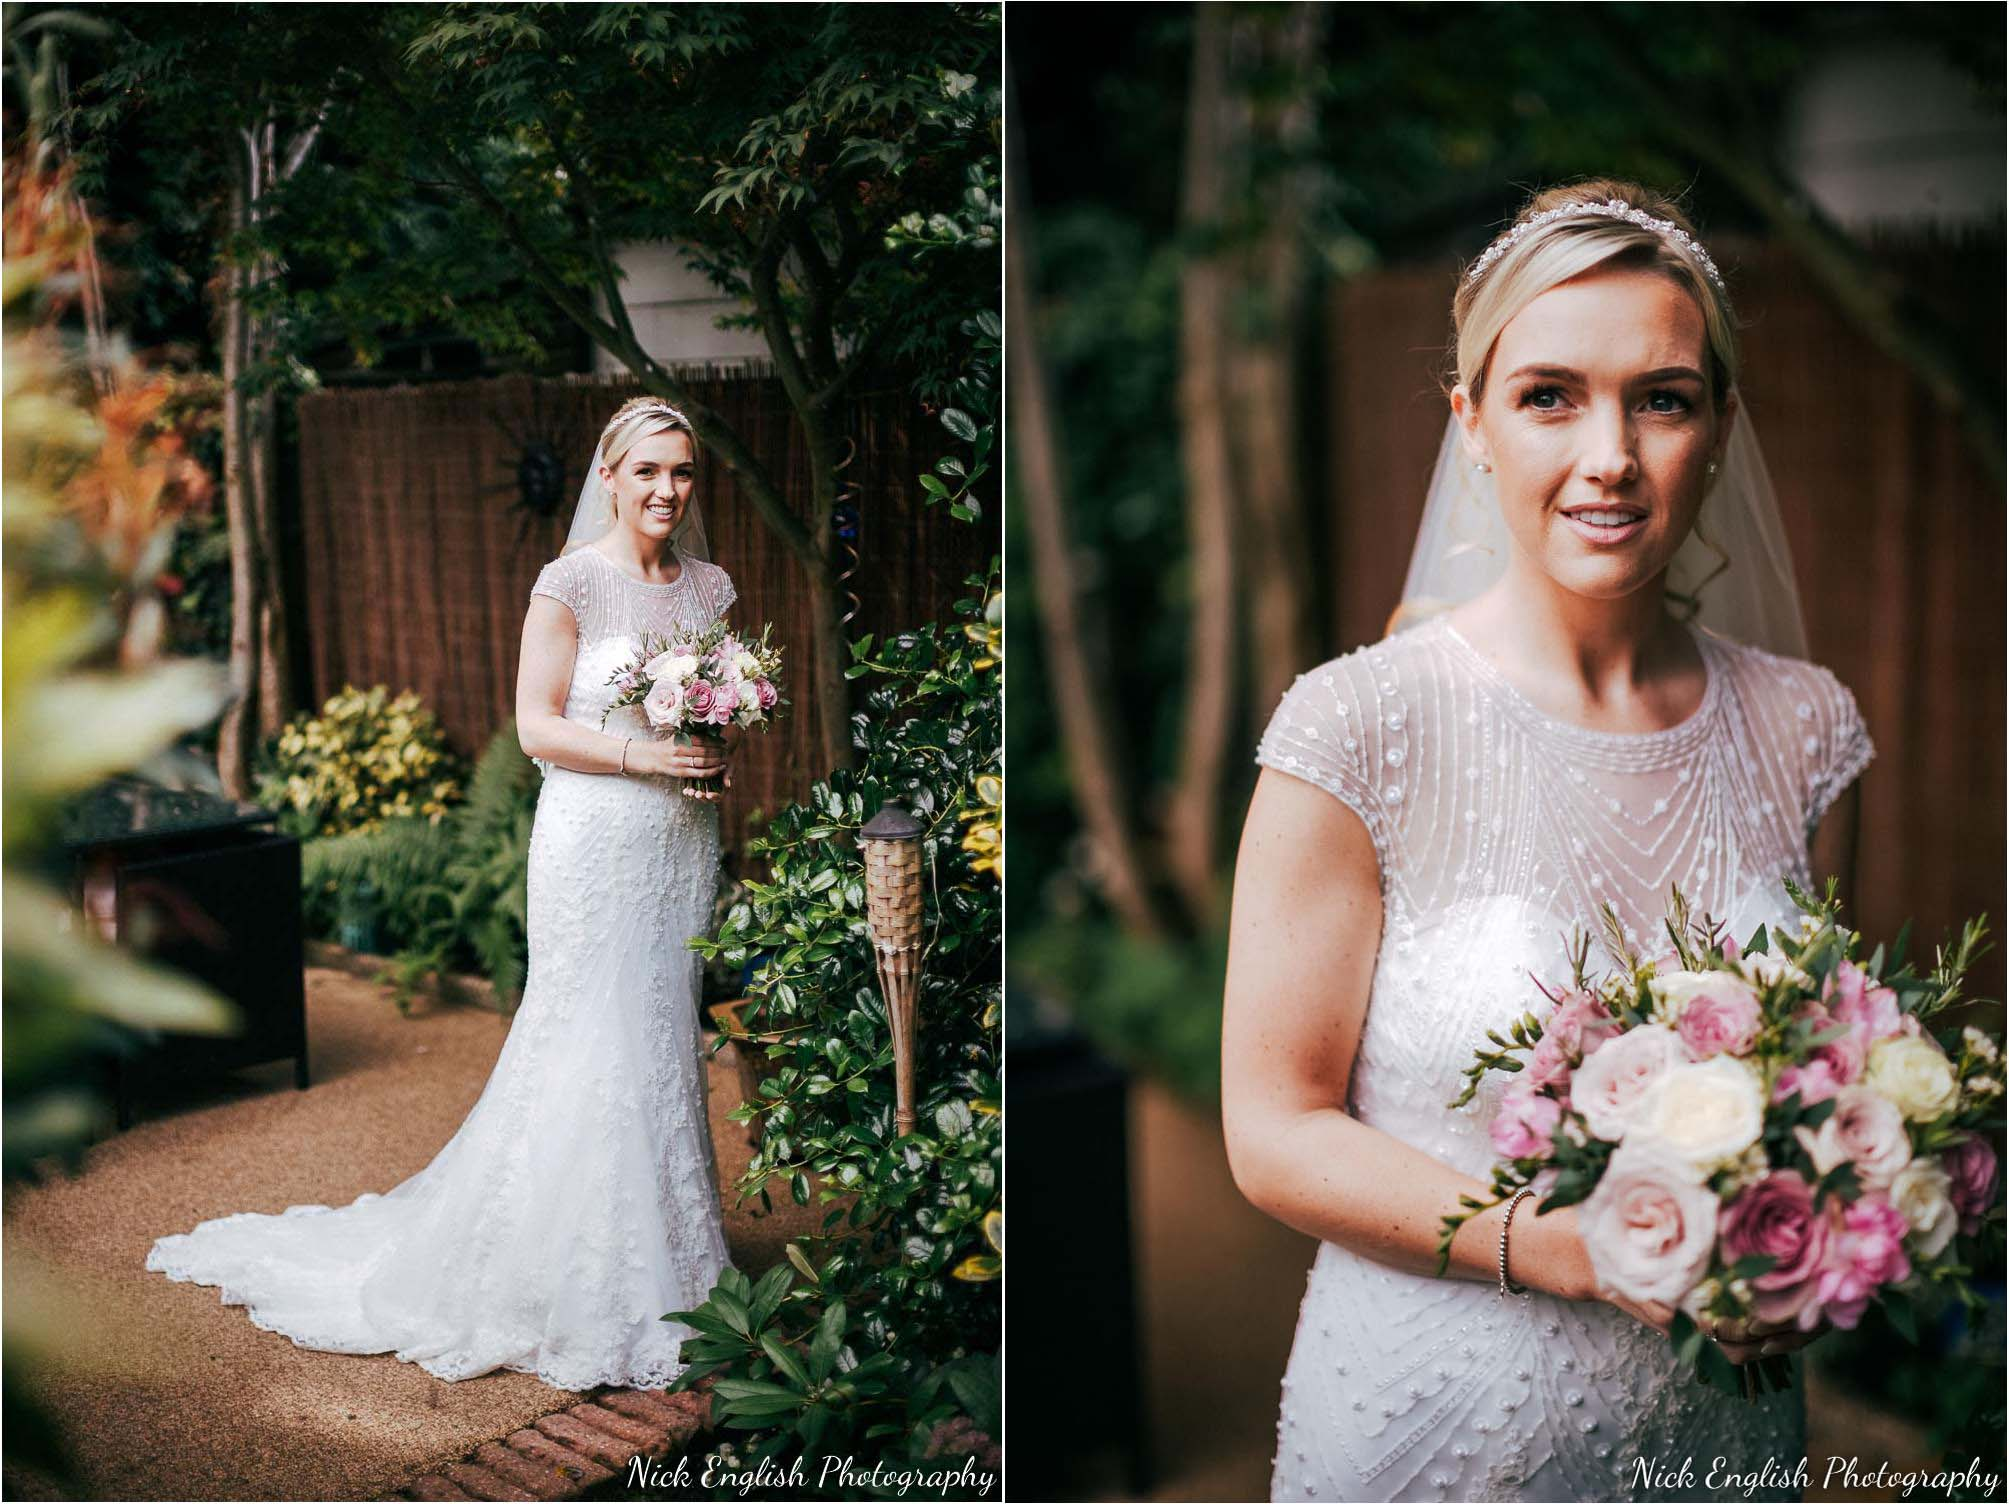 Mitton_Hall_Wedding_Photograph-30a.jpg